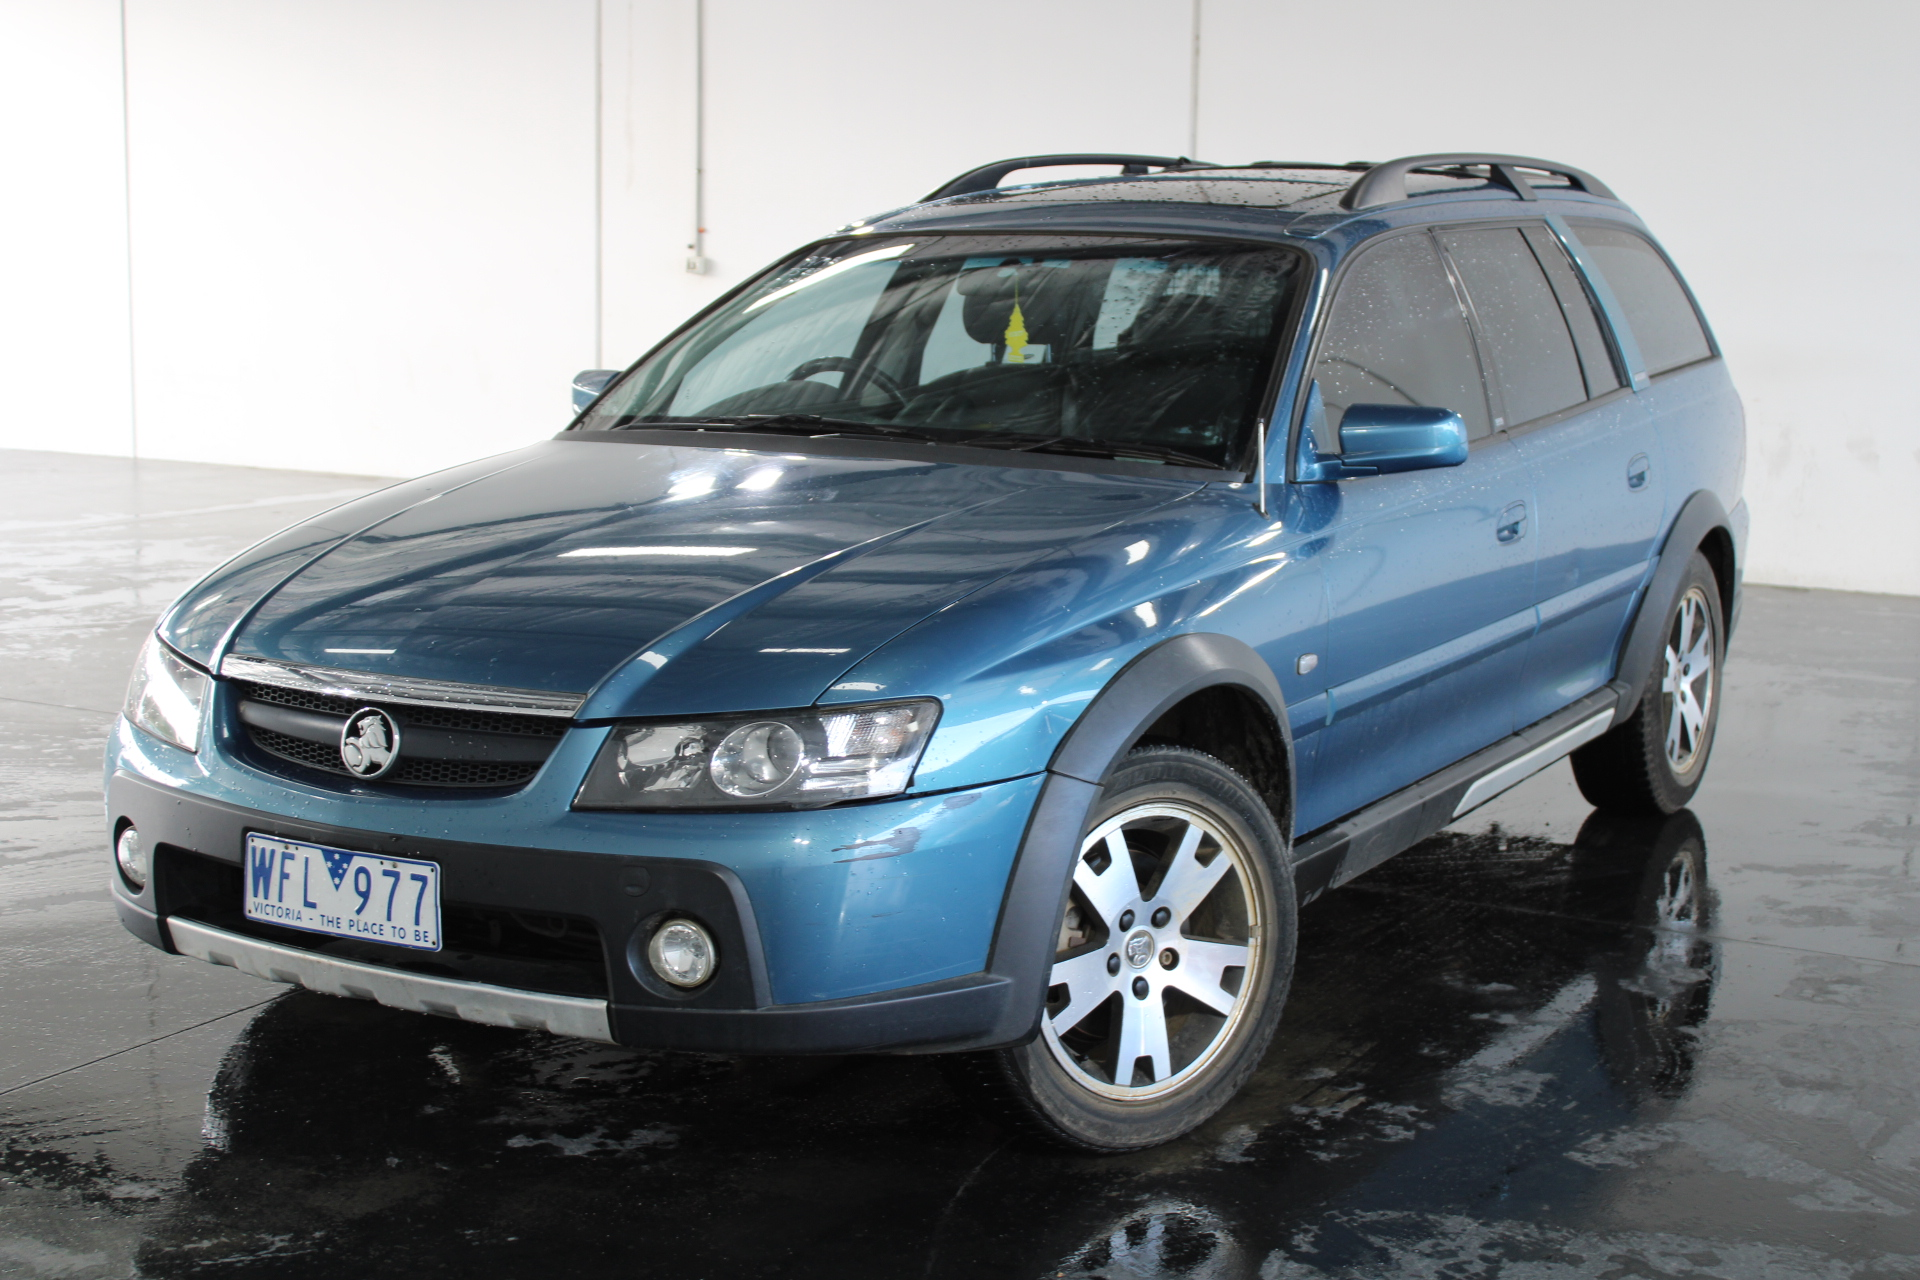 2005 Holden Adventra LX6 VZ Automatic Wagon